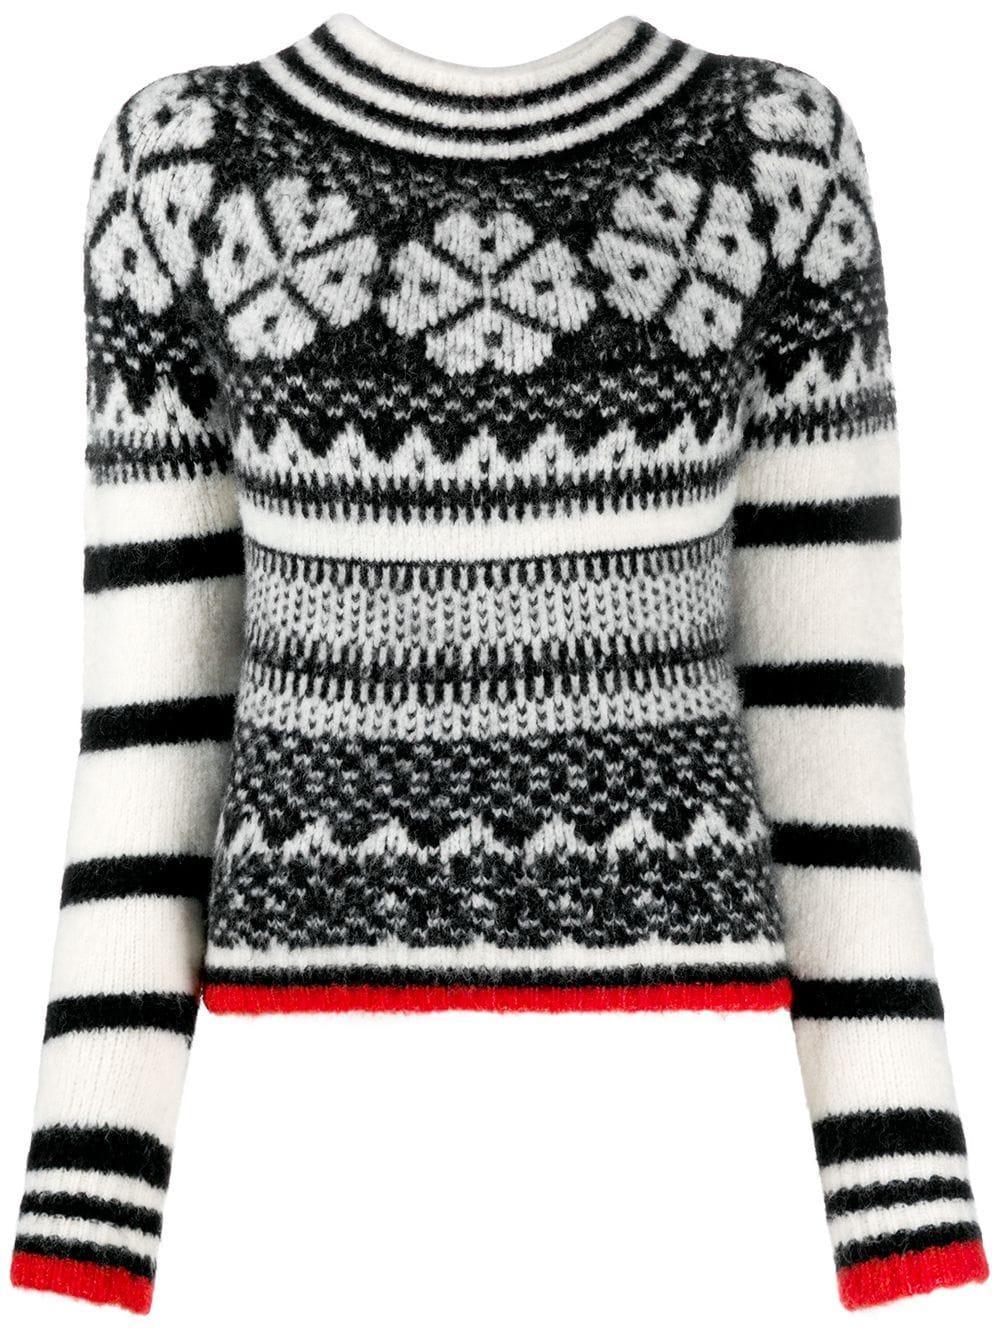 Stripe and Fairlsle Graphic Sweater